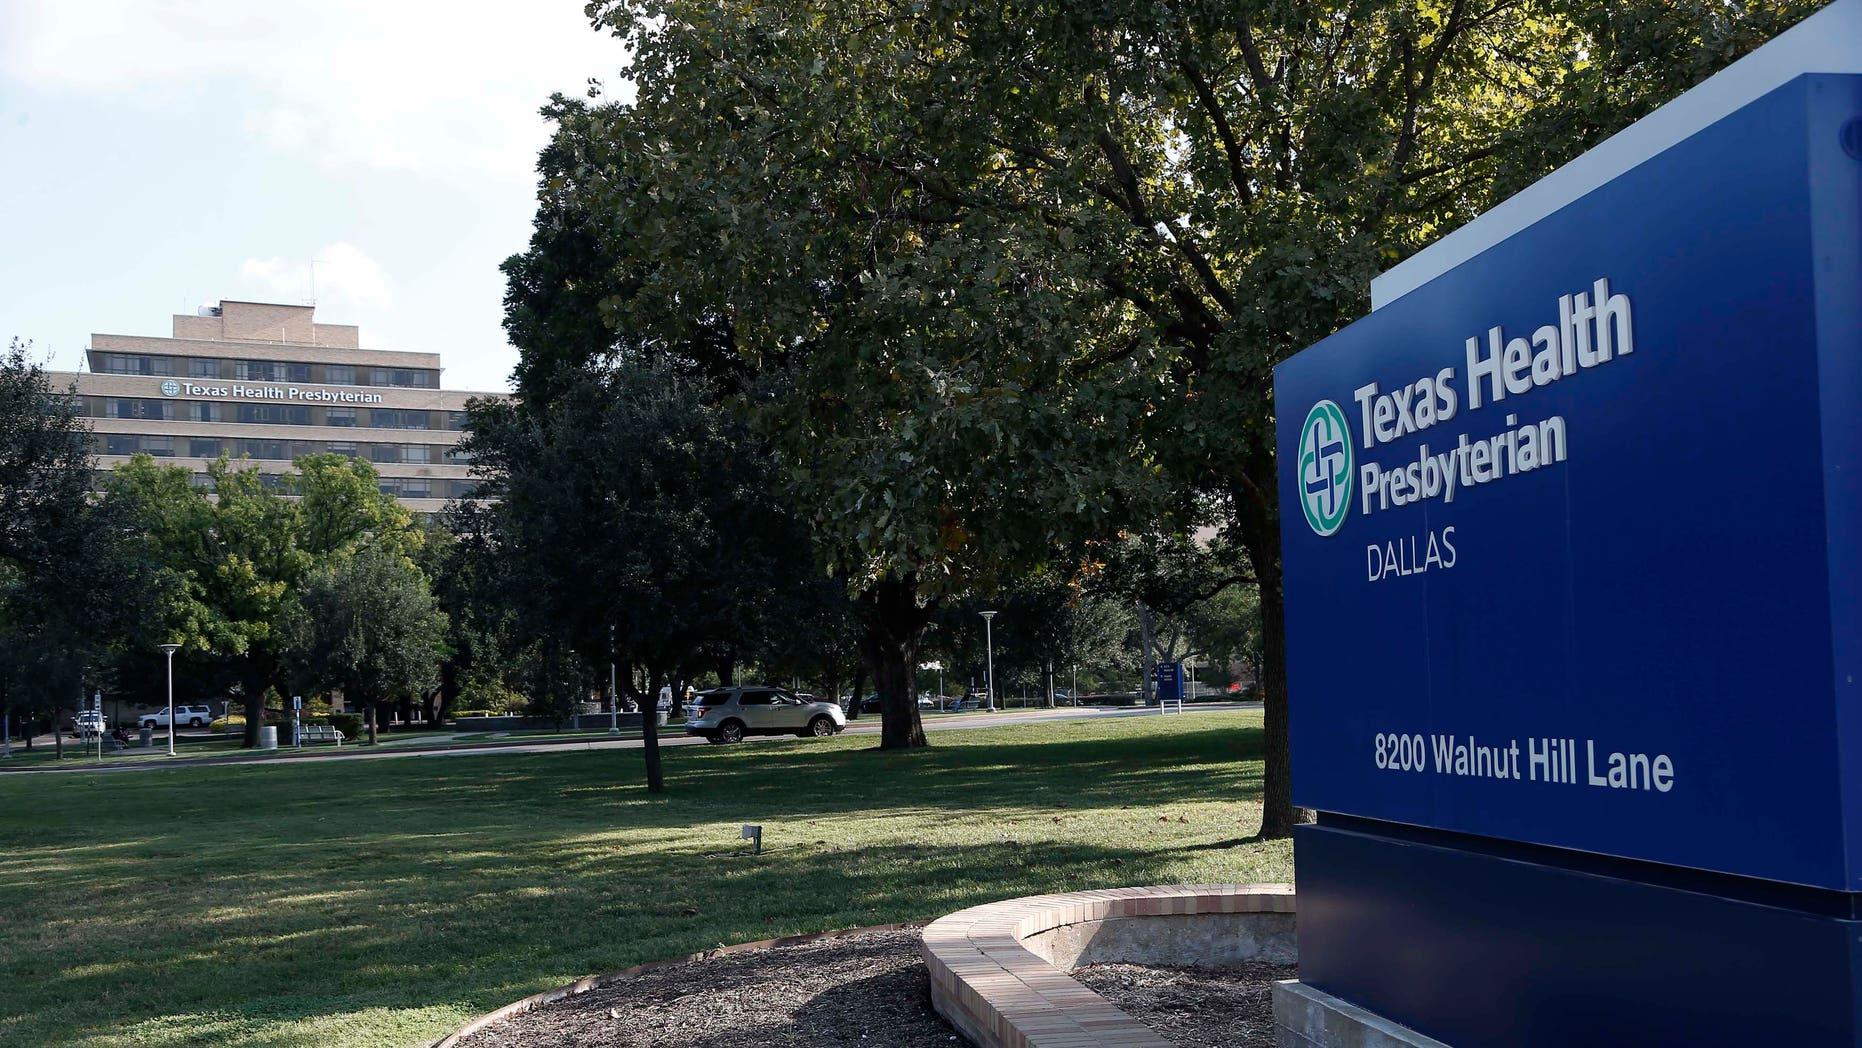 A general view of the Texas Health Presbyterian Hospital in Dallas, Texas September 30, 2014. REUTERS/Brandon Wade